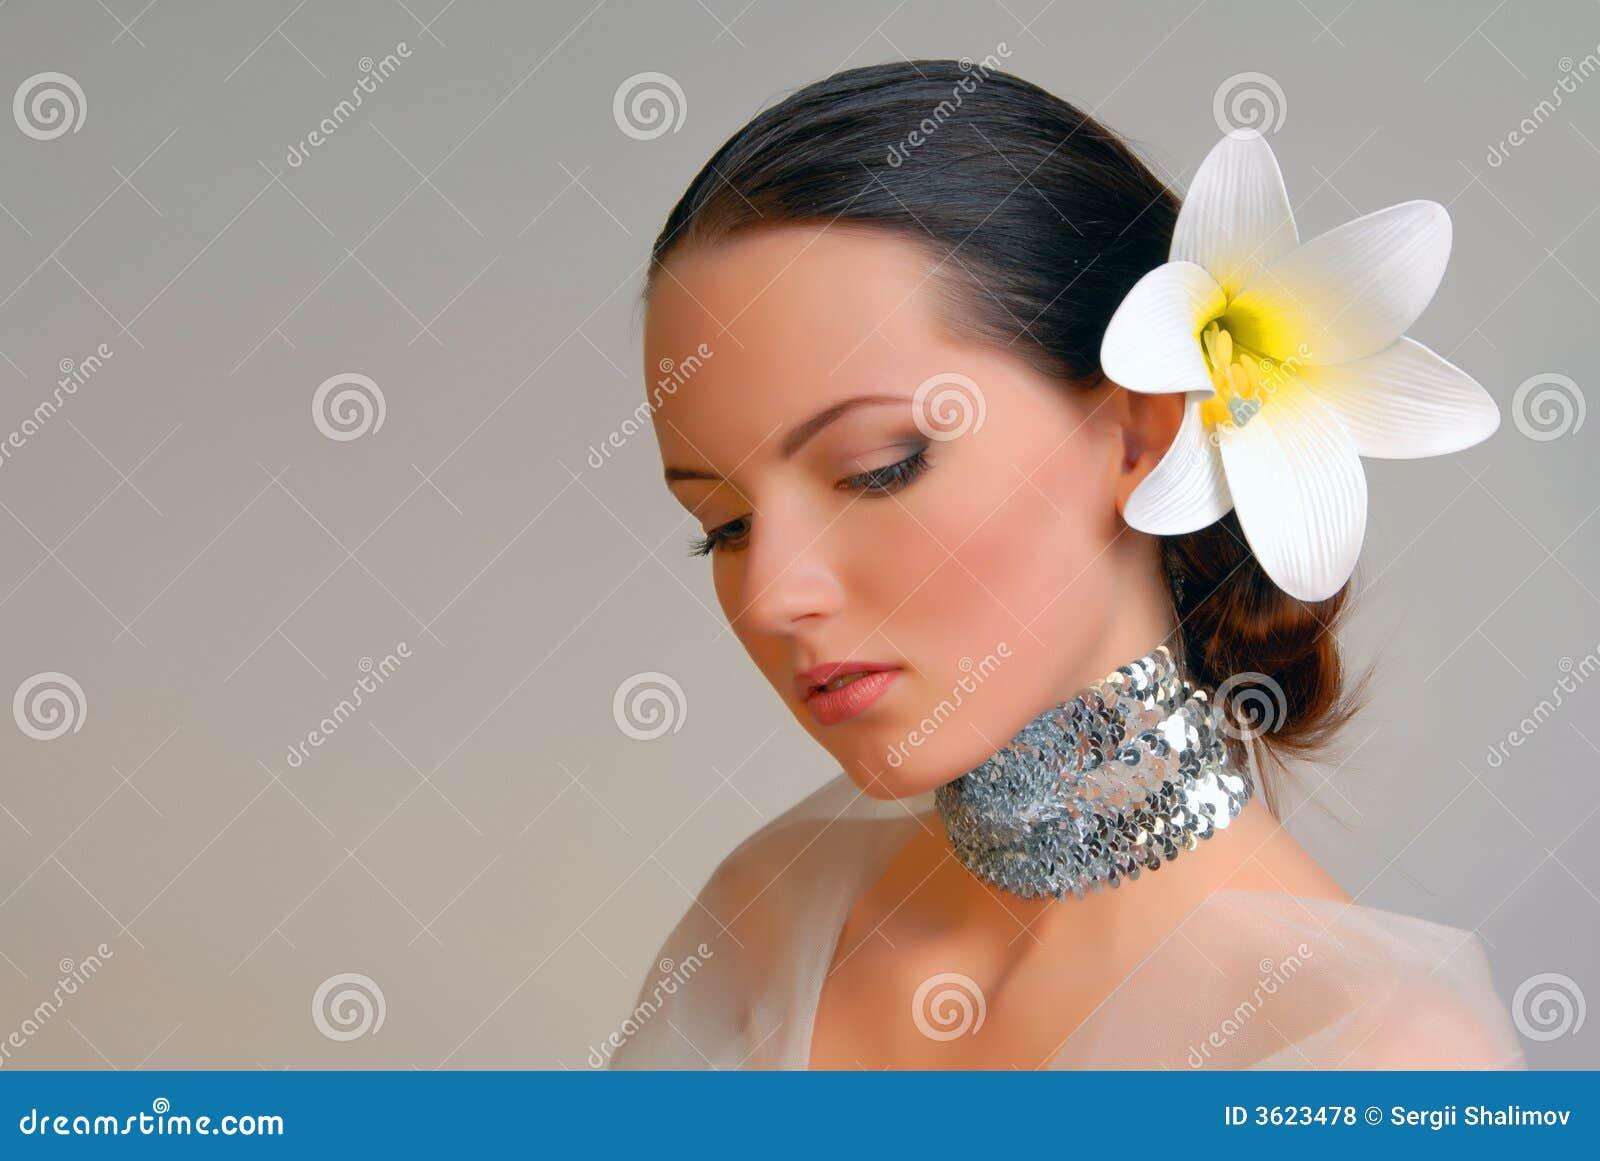 Extravagant Bride Stock Photo Image Of Image Face Coiffure 3623478